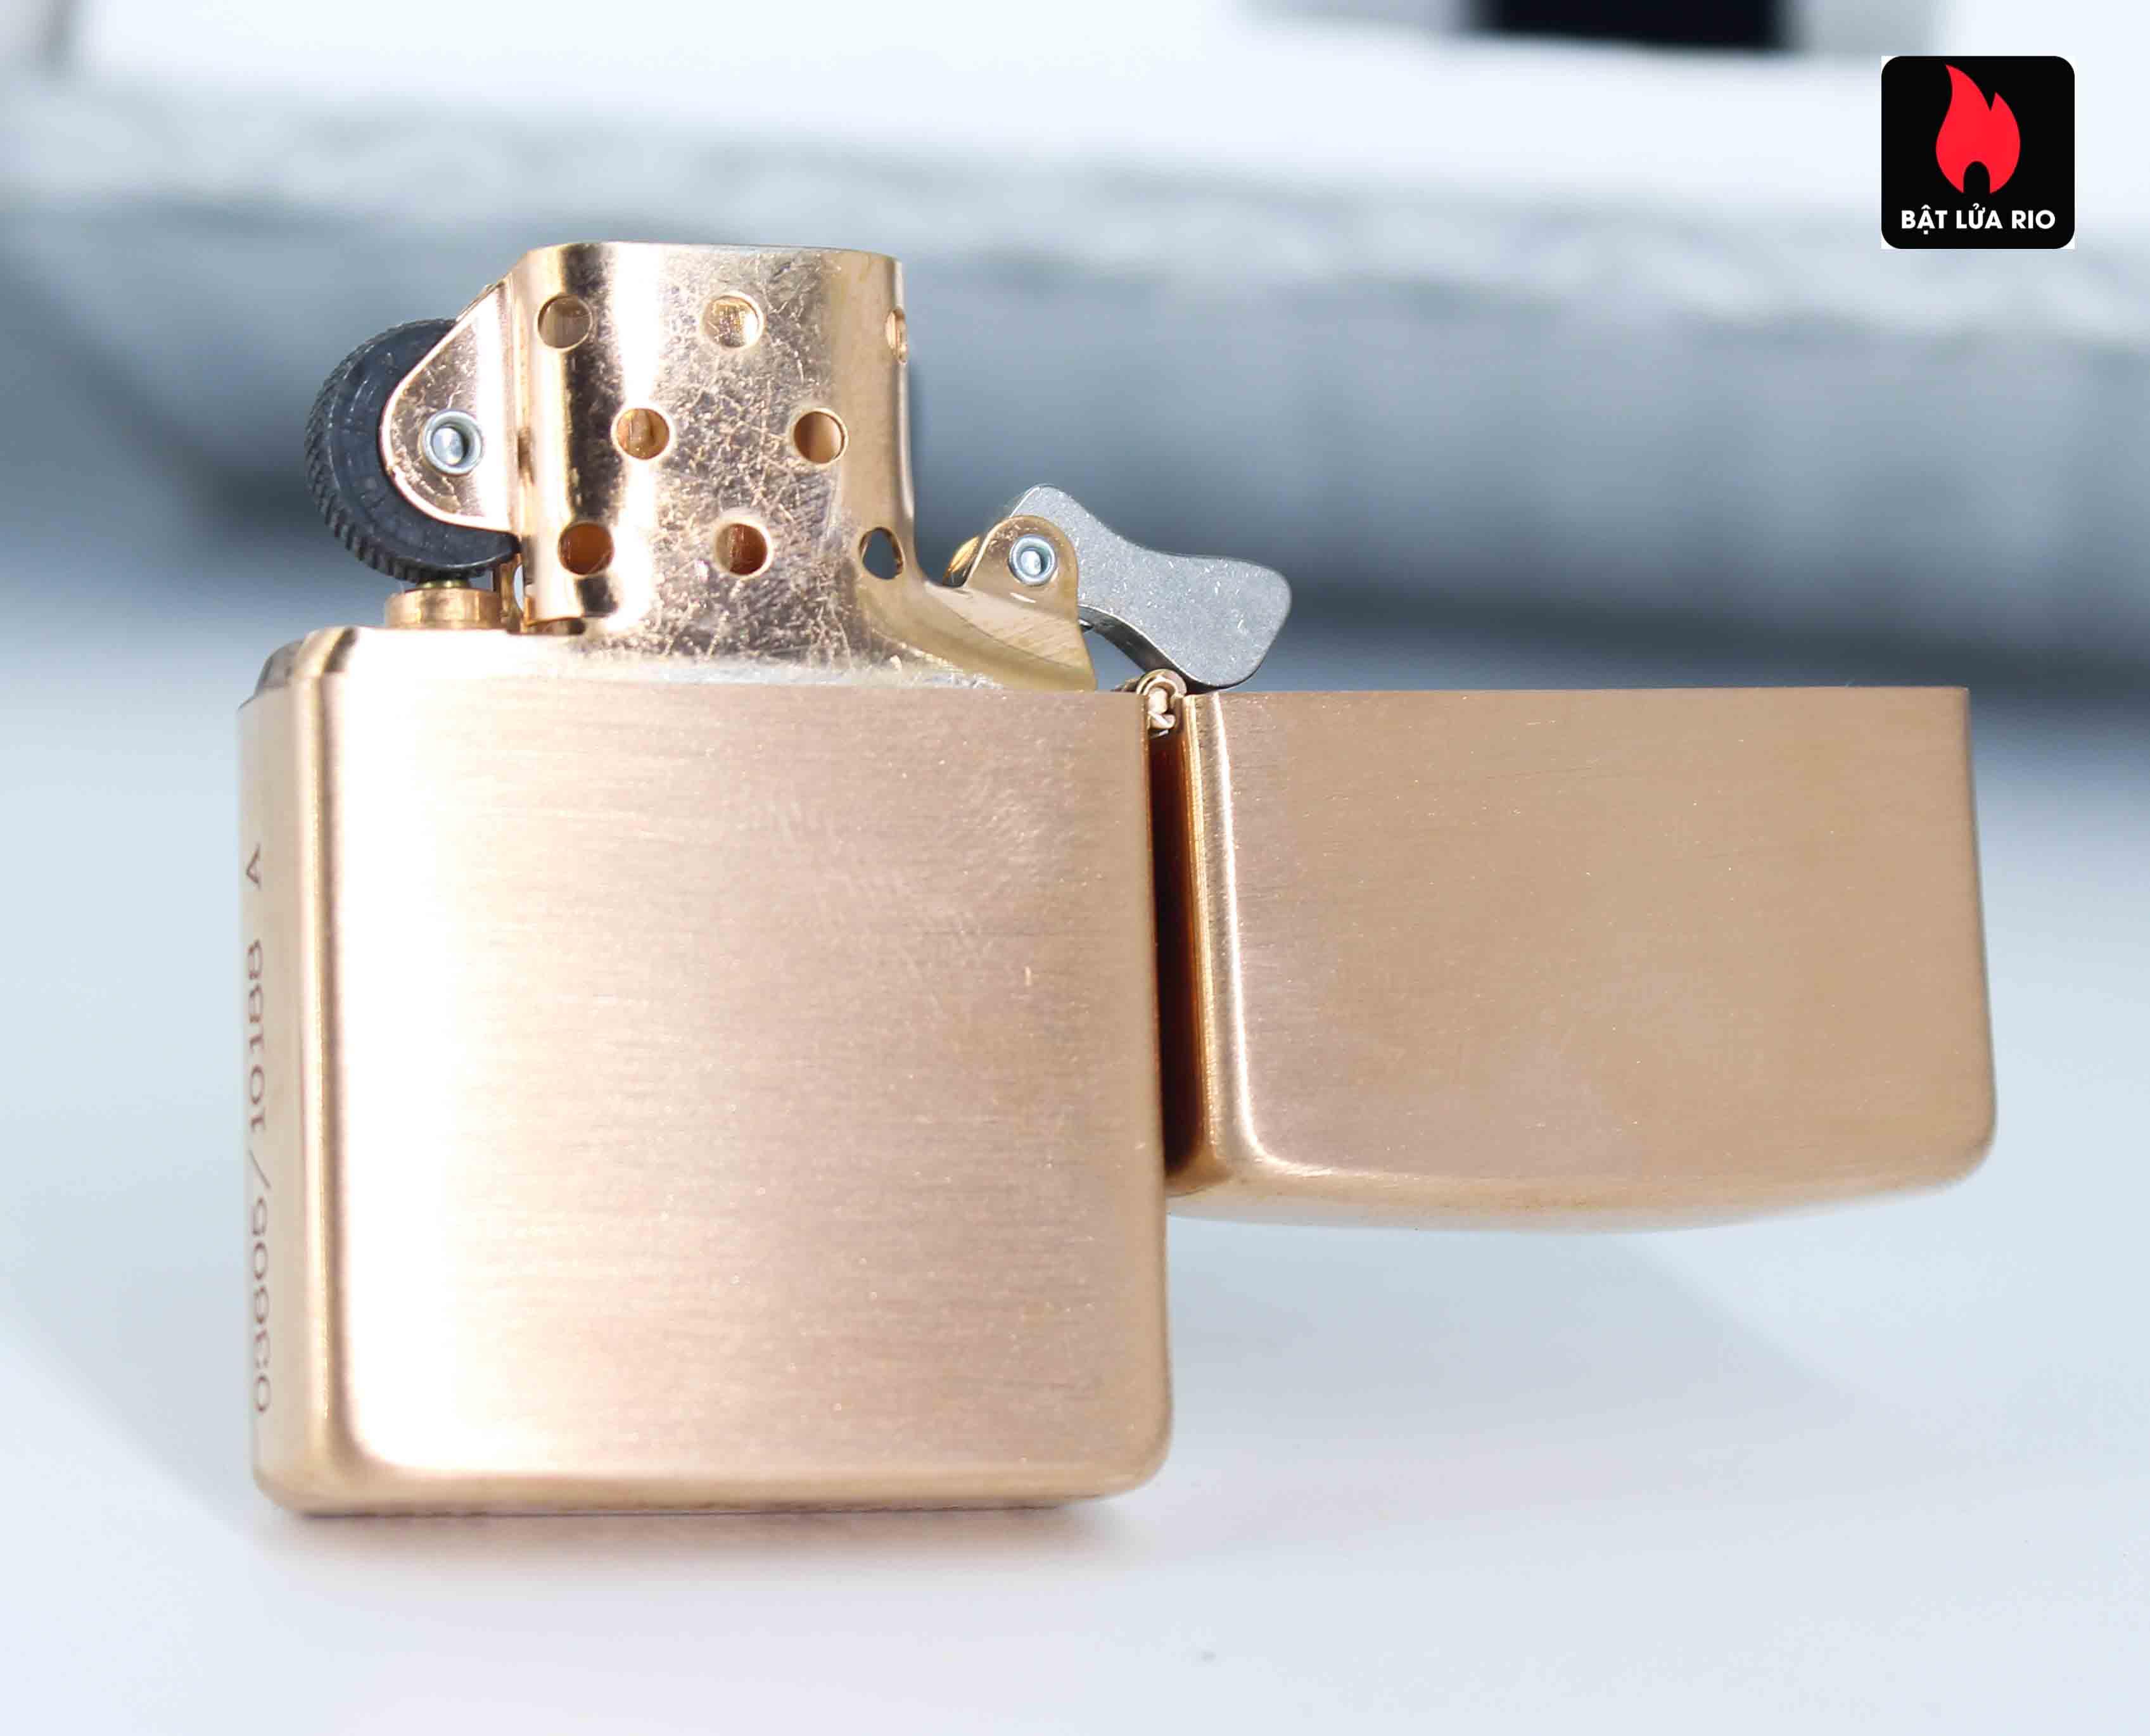 Zippo 2002 – Zippo Z-Series Copper Project – USA - Limited 03605/10188 A 4